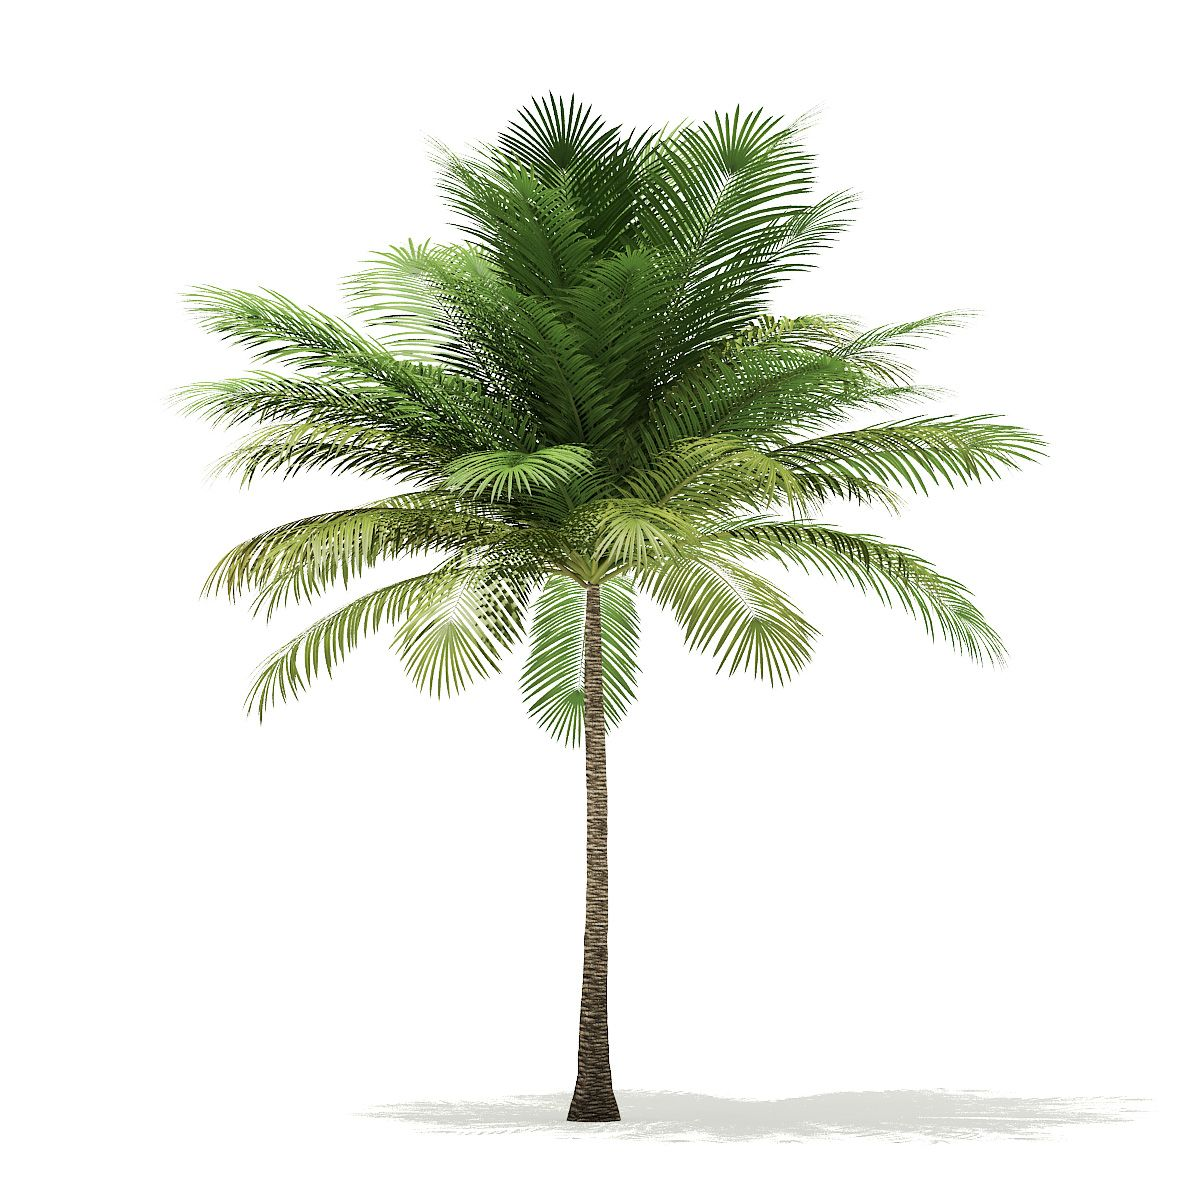 Coconut Palm Tree 3D Model 6m #Palm, #Coconut, #Model, #Tree